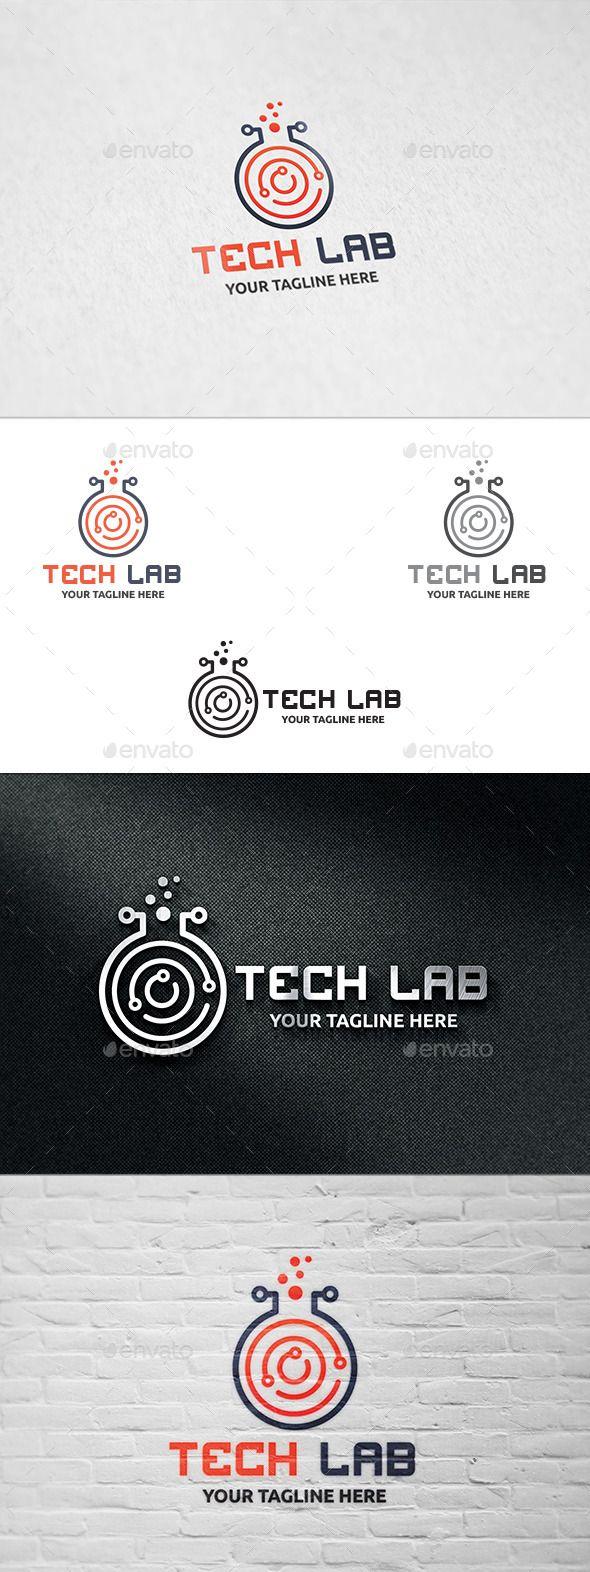 Tech Lab - Logo Template